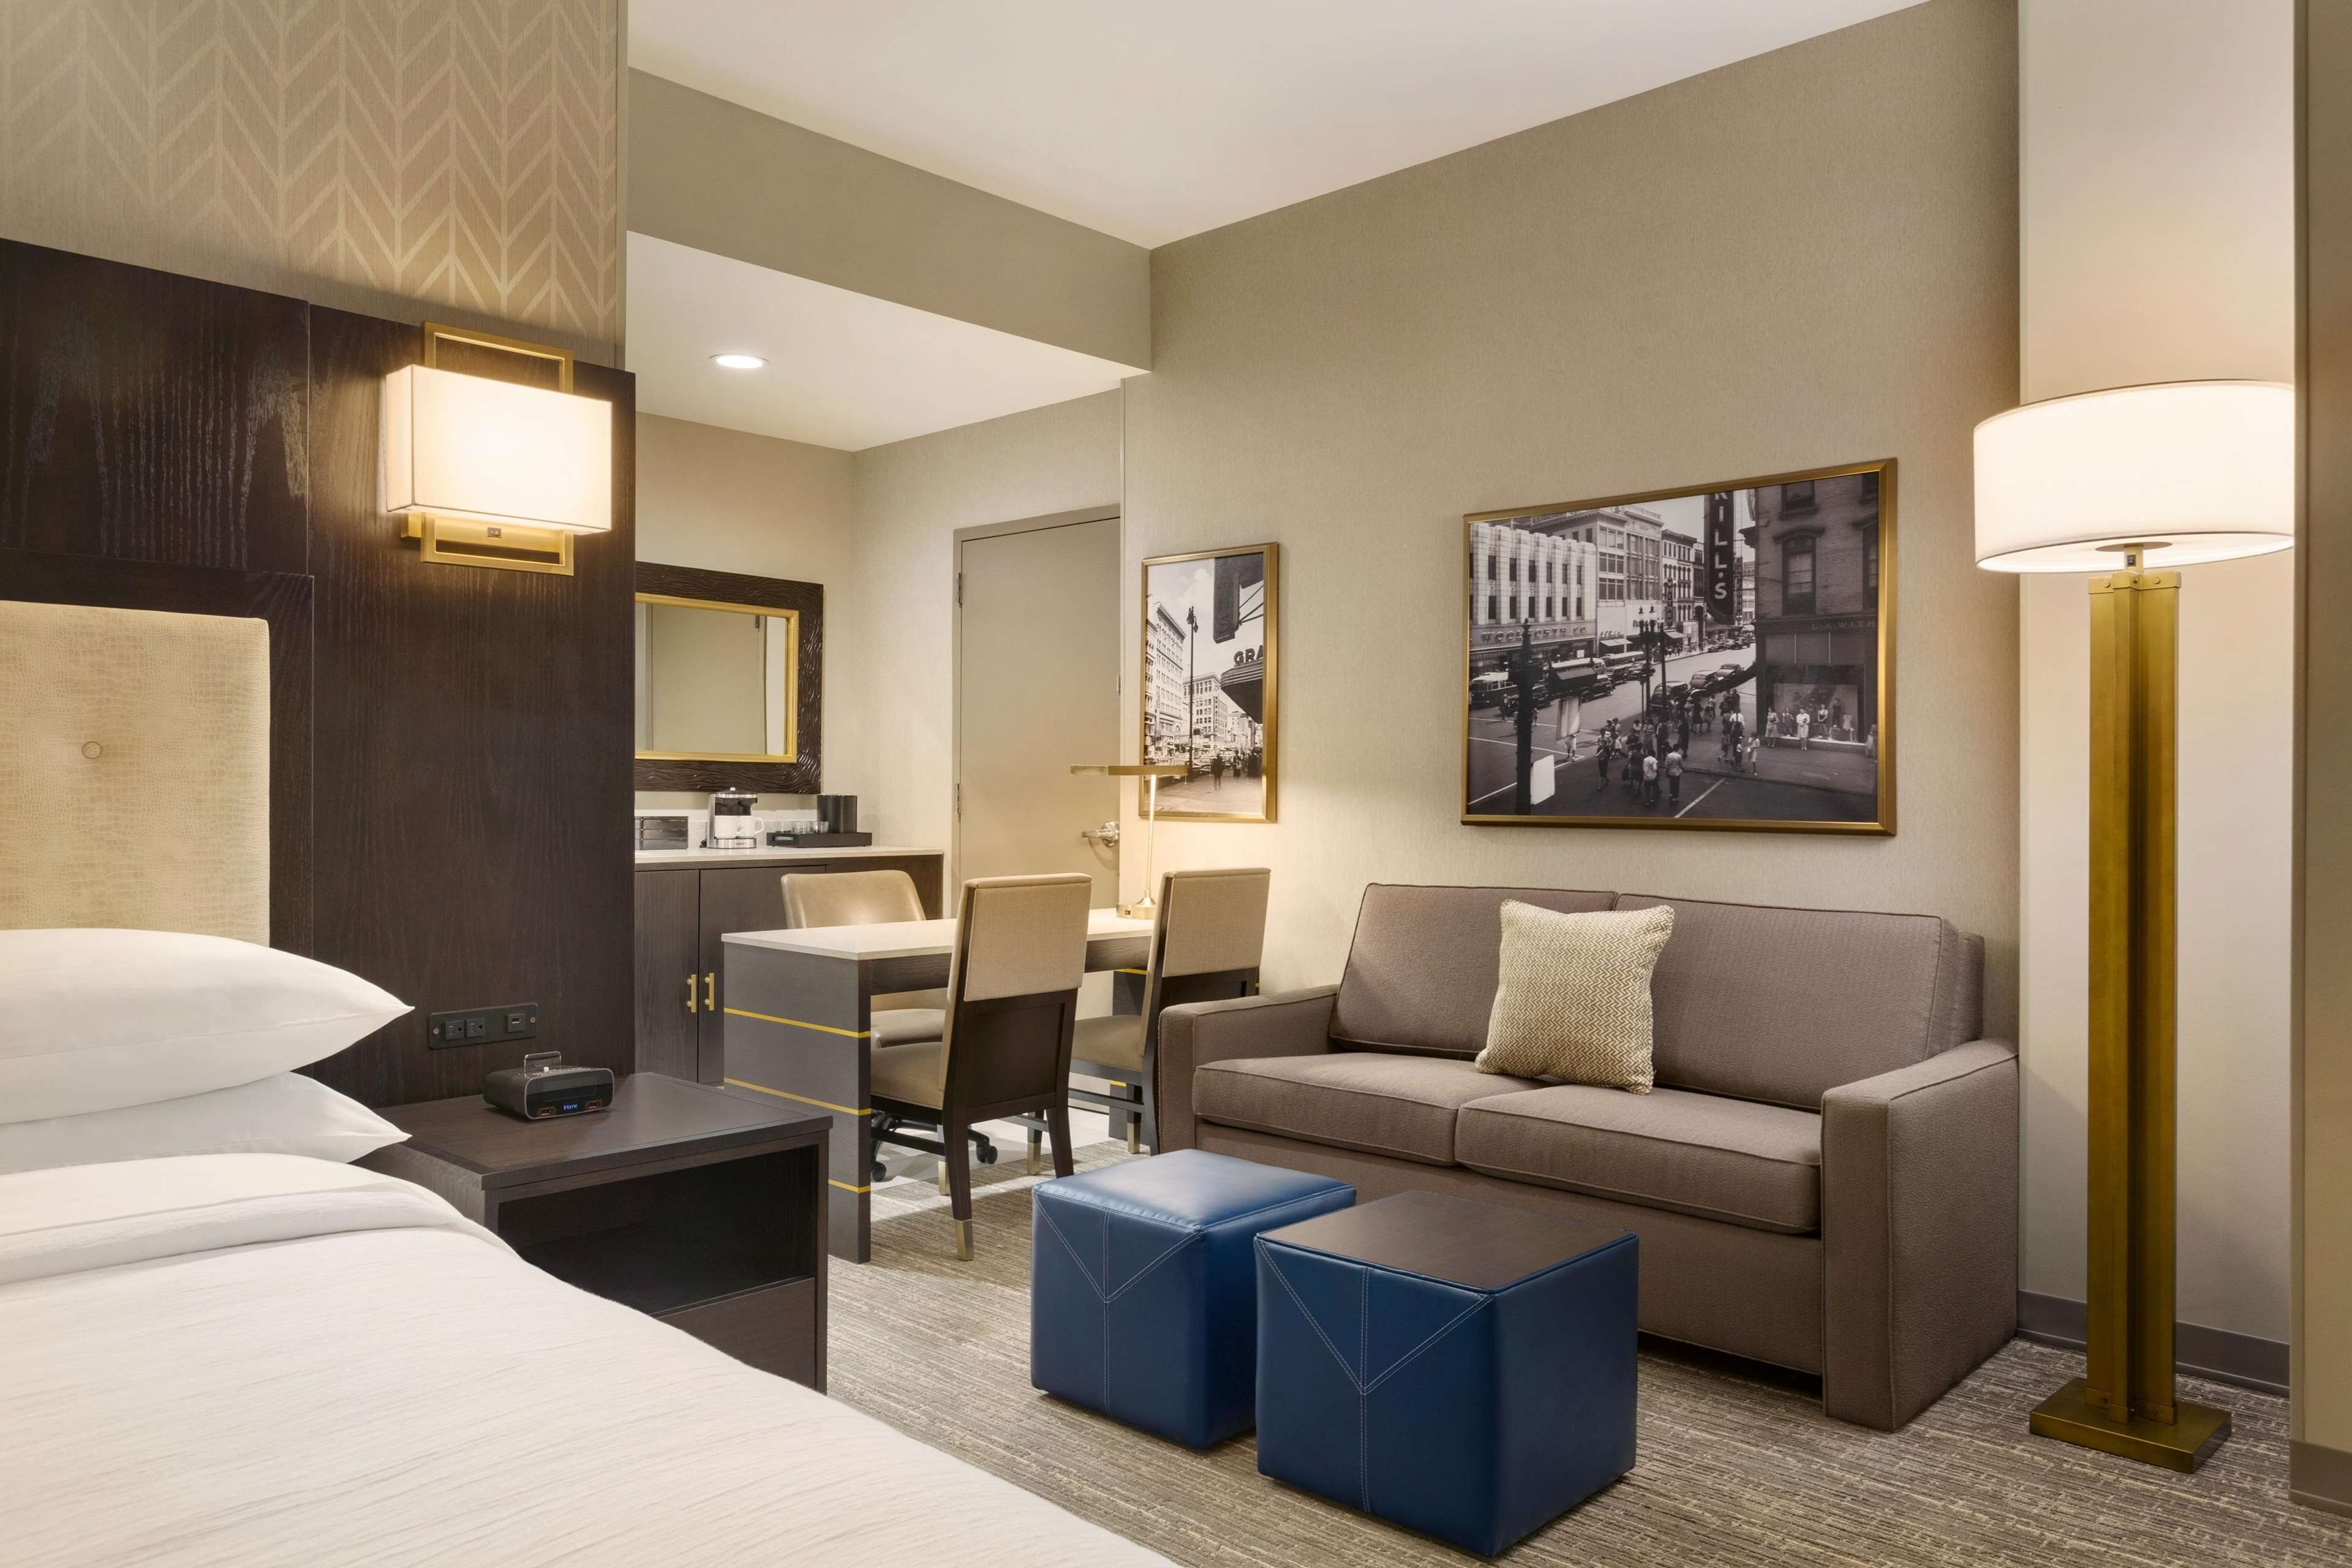 Embassy Suites by Hilton Syracuse Destiny USA image 8